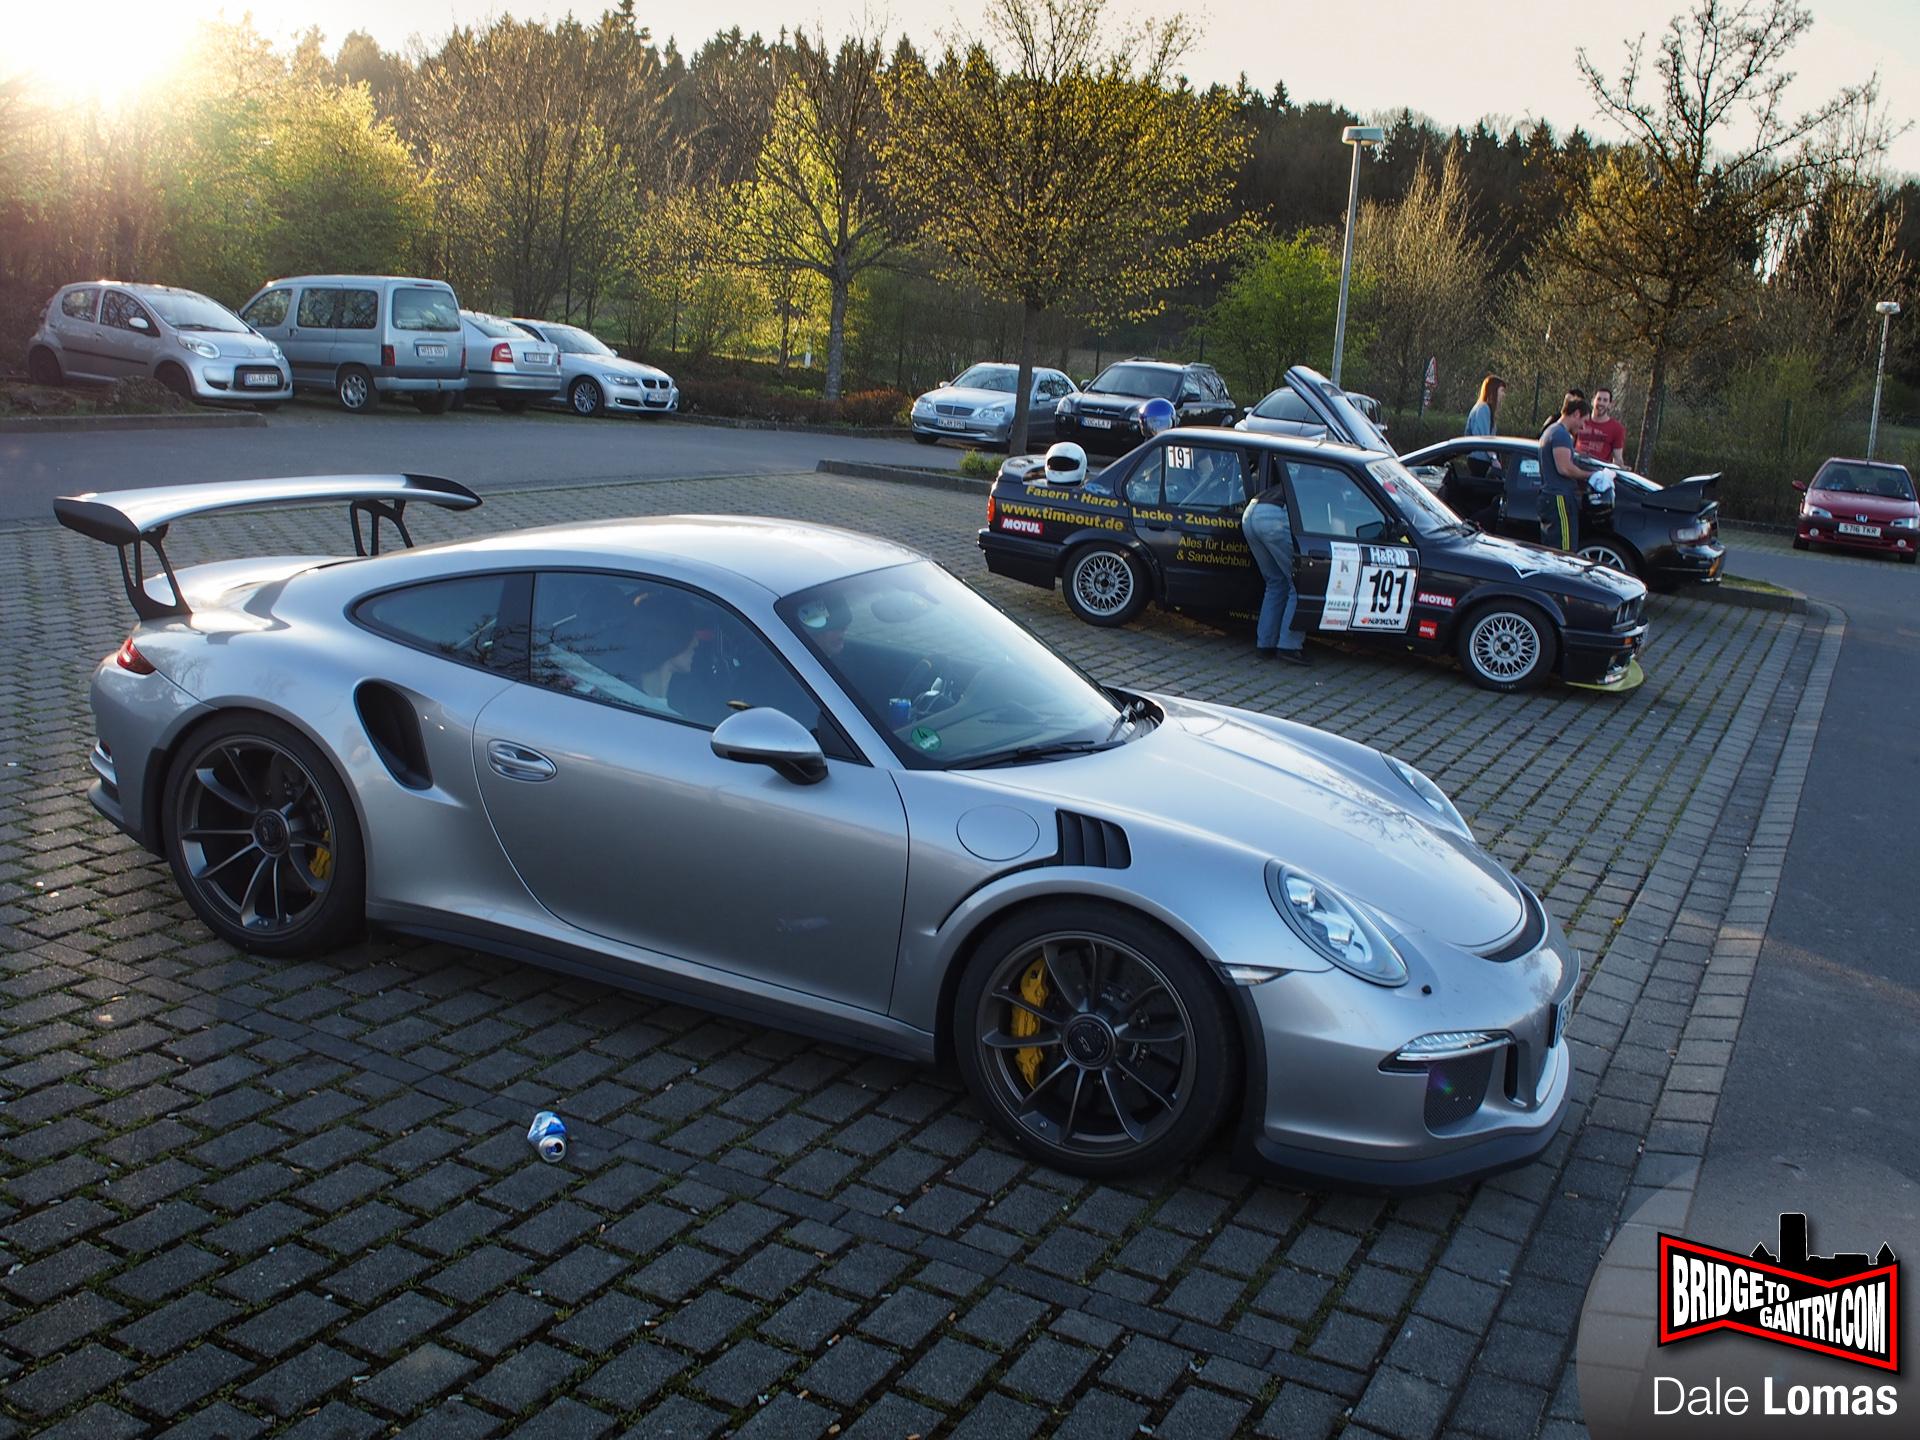 BridgeToGantry com | Unofficial Nürburgring news, laptimes, photos